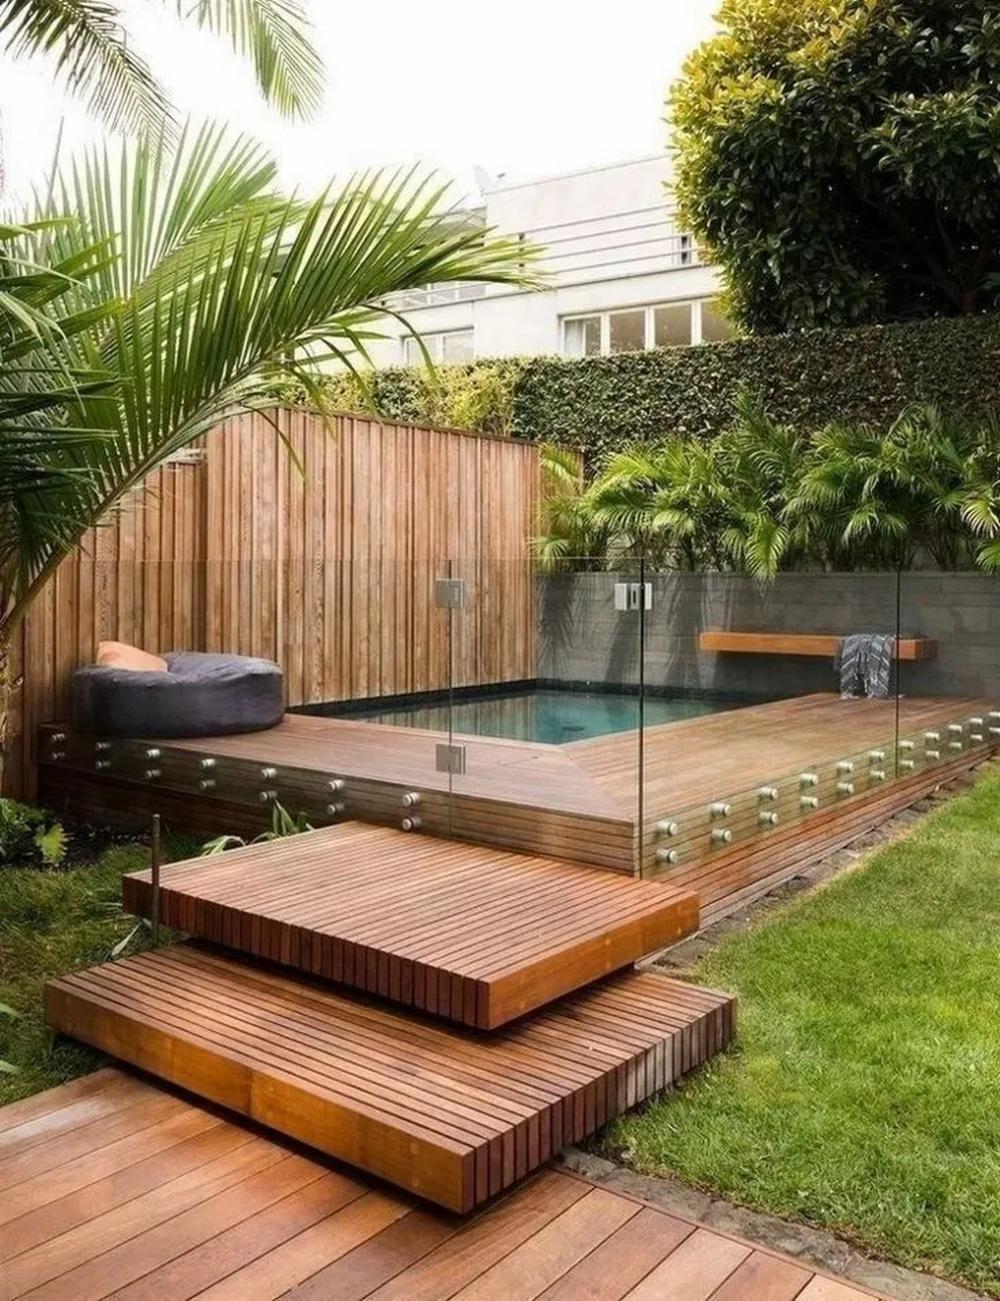 Pin On House Backyard